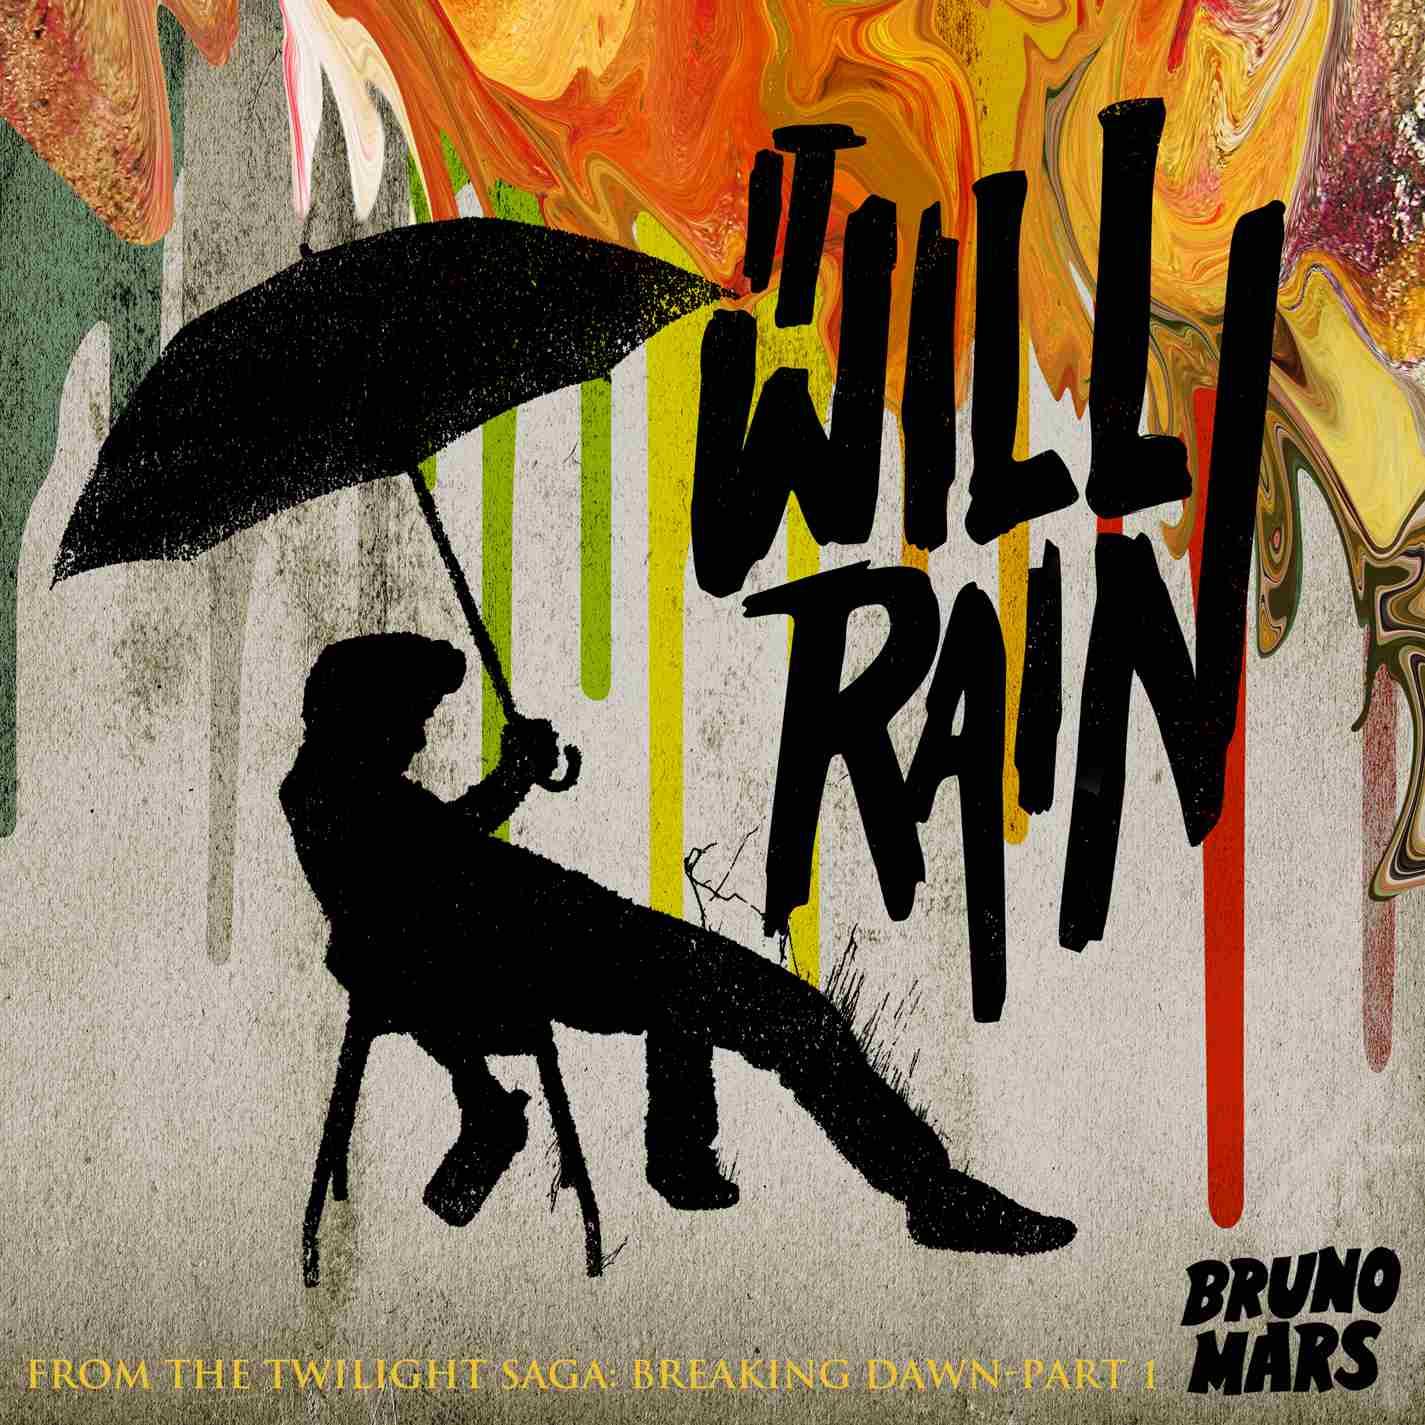 Bruno Mars It Will Rain